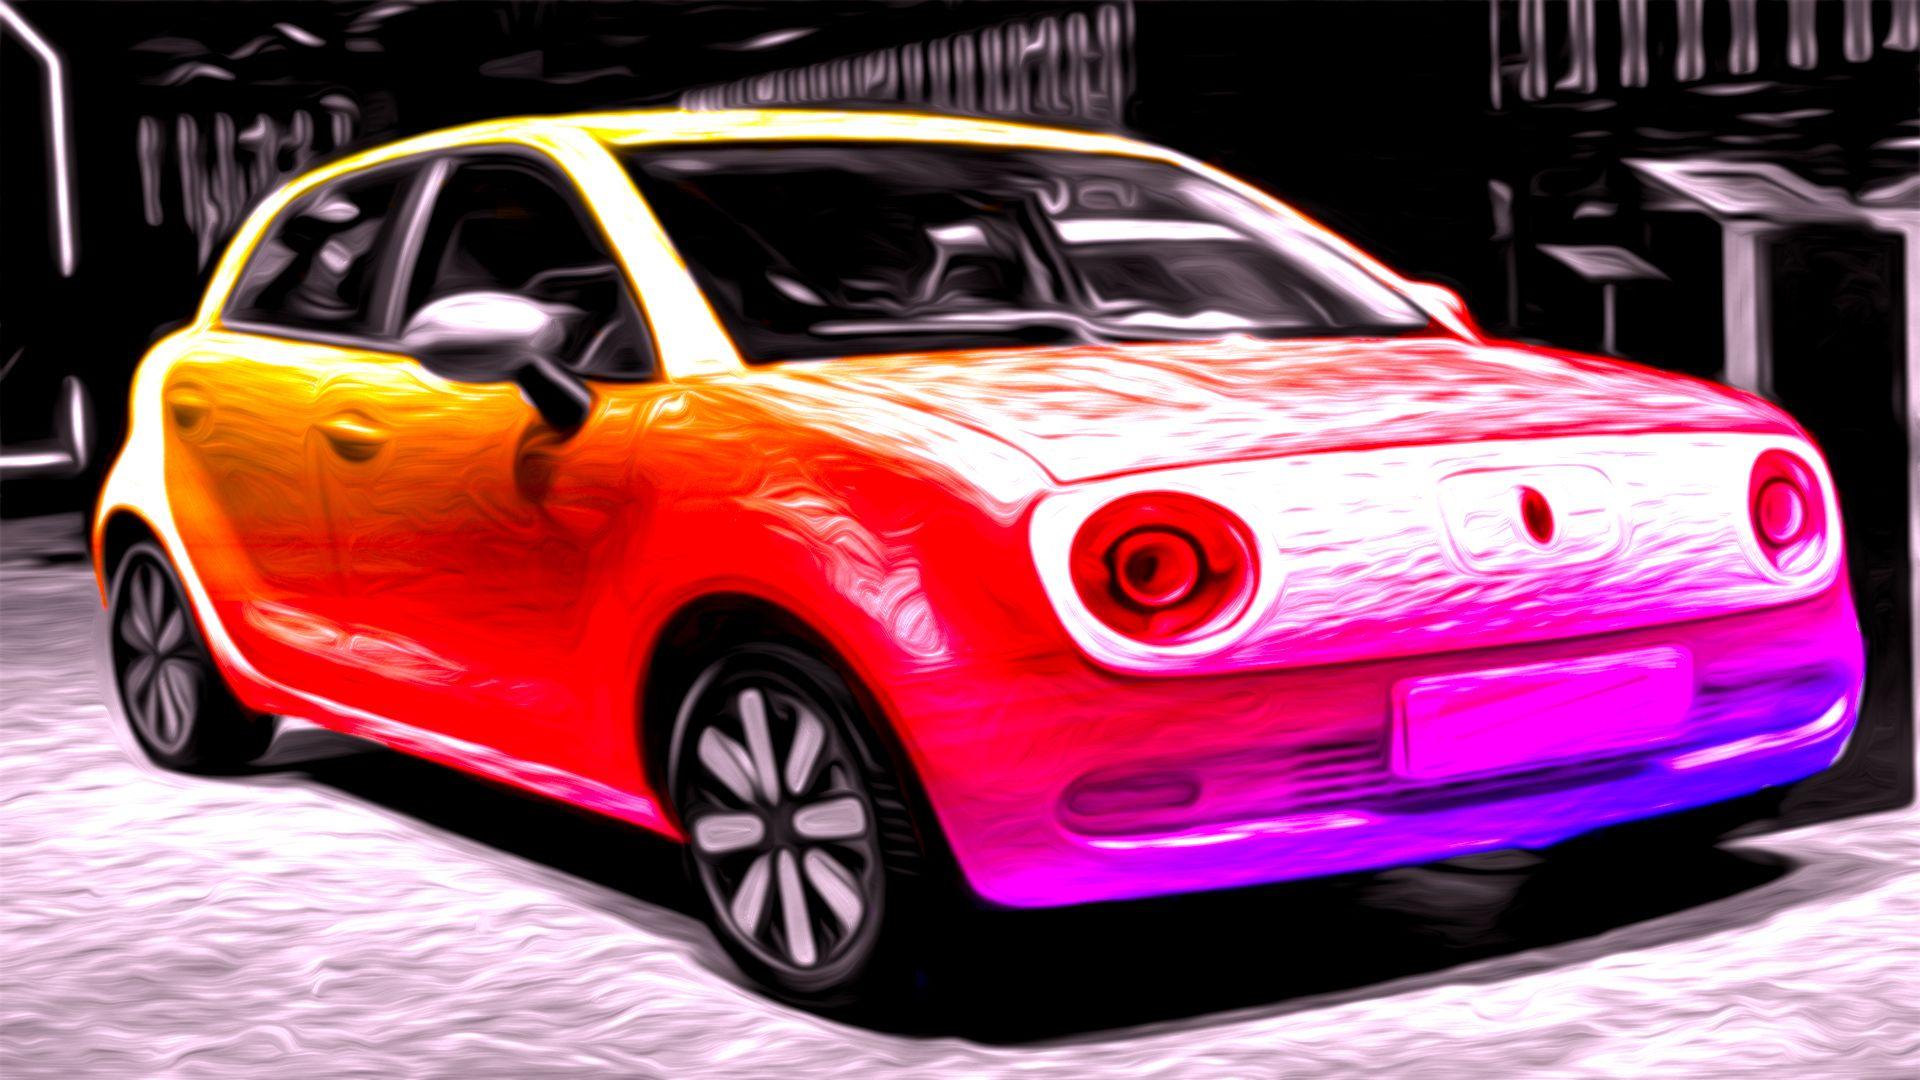 Illustration By Dipti Dhakul  Car Illustration-Car lover- Car Design-Carsketch-Car Design  cars car lover  car auto #carsofinstagram #autodesign carbn footprint car sketch cardrawing  cardesign cardesigndaily designforcar cardesigncommunity  autodesignart artist